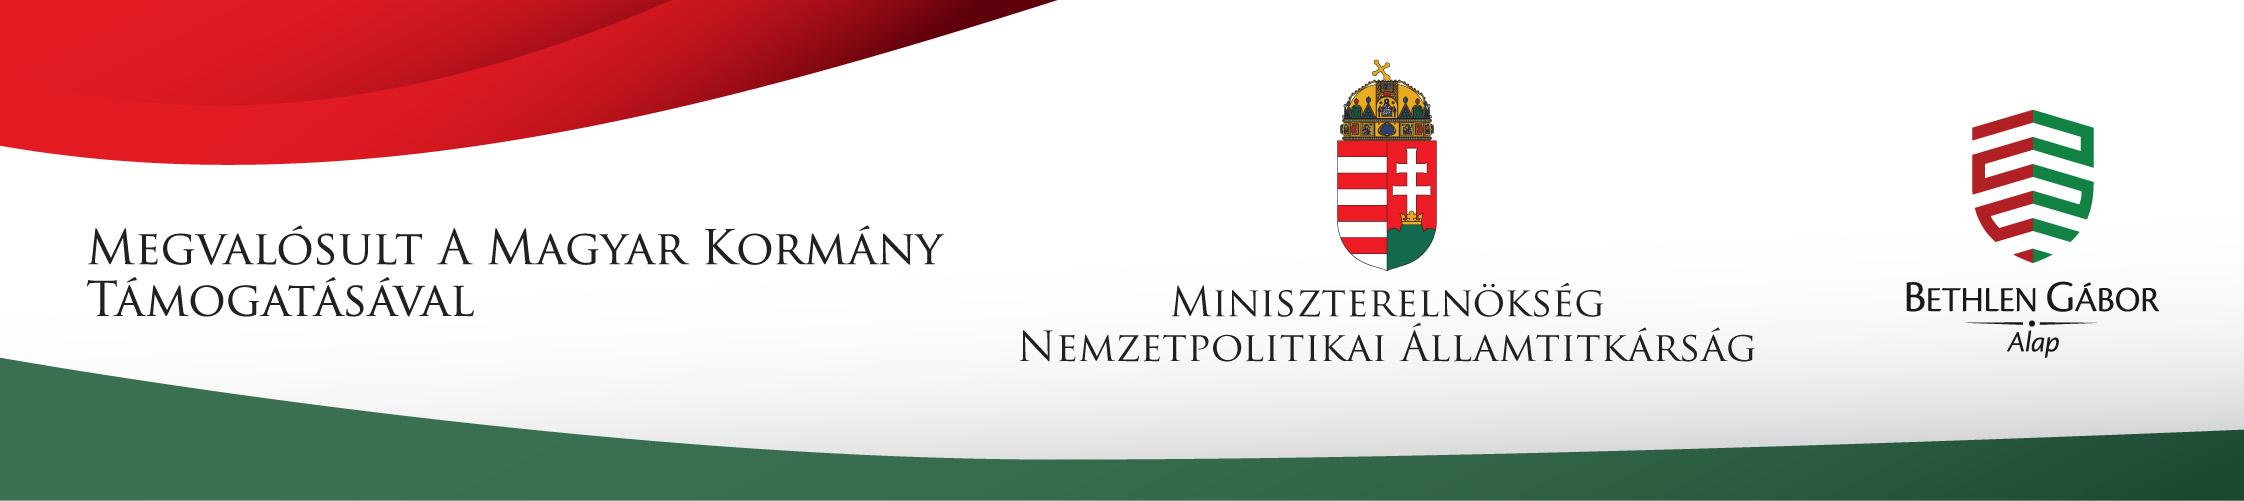 https://hungarianhub.com/wp-content/uploads/2019/10/megvalosult_a_magyar_kormany_tamogatasaval_bga_alap.jpg